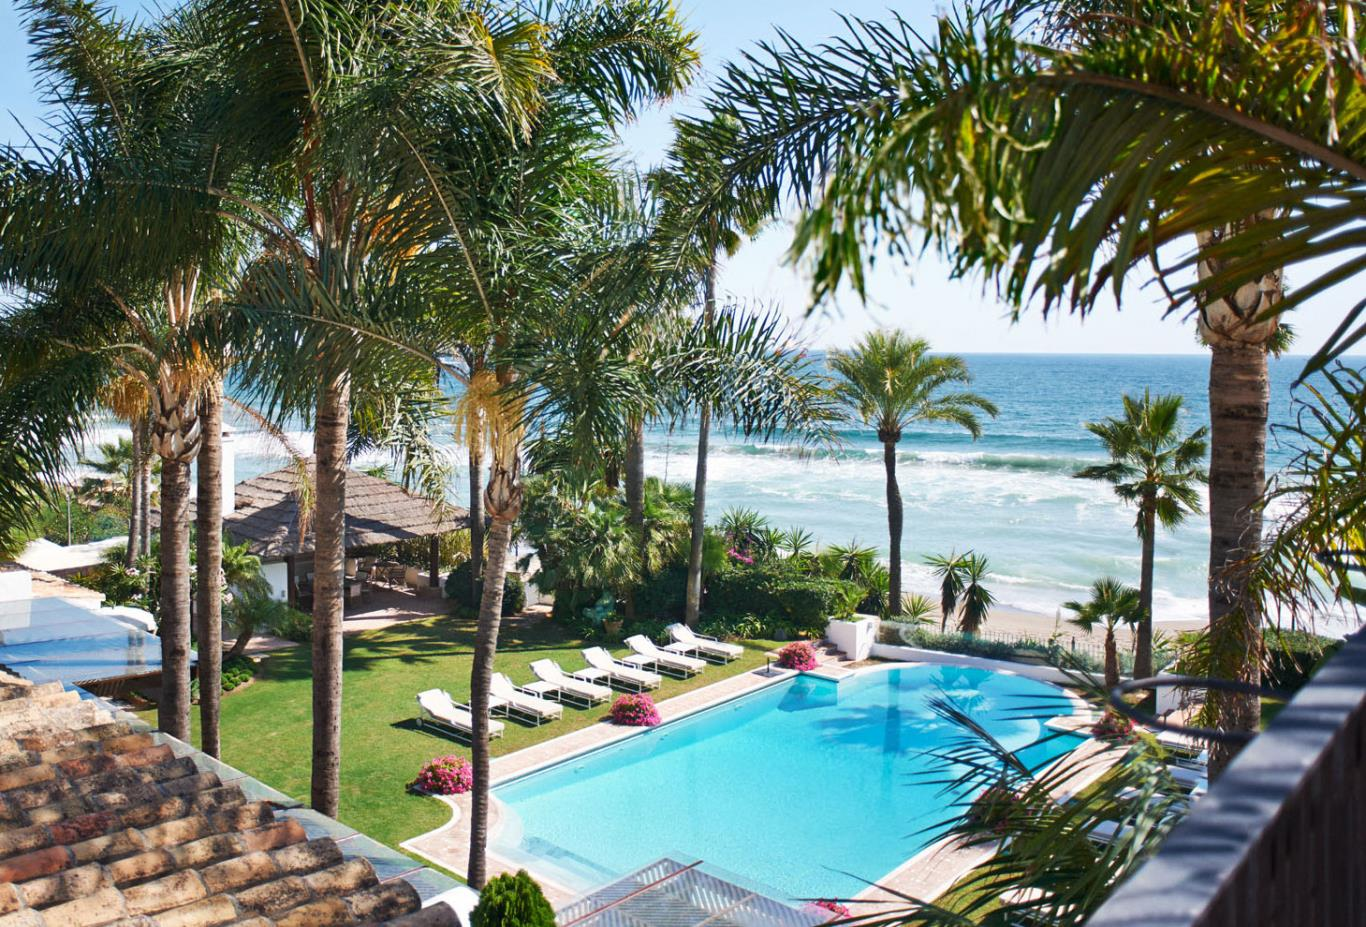 Villa Del Mar - View from suite 1